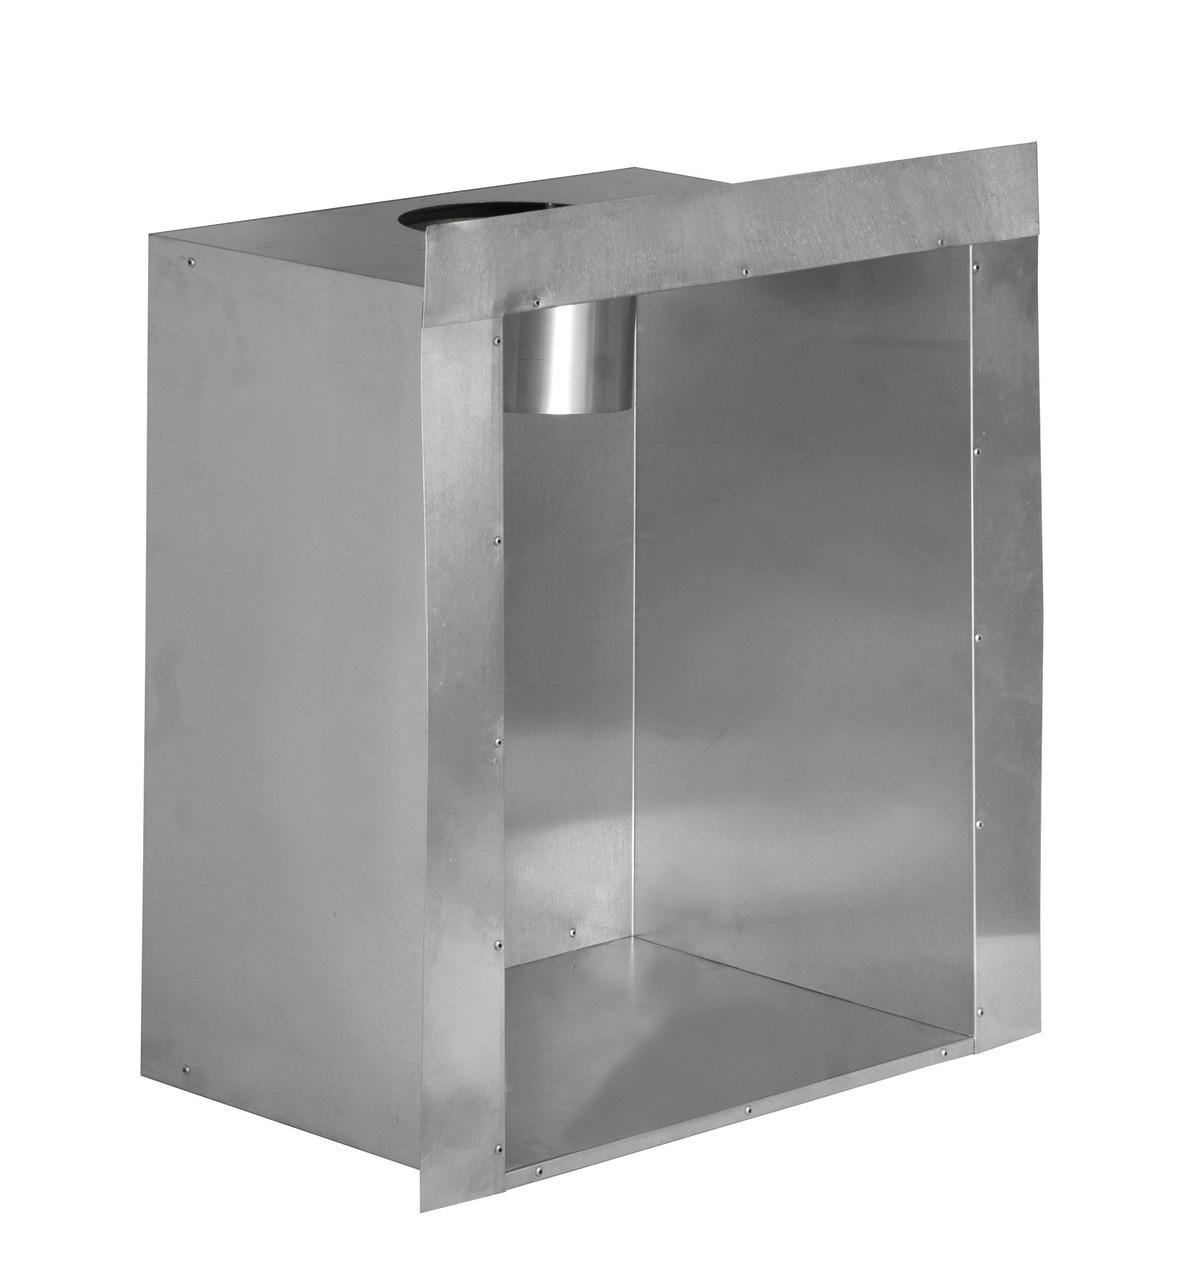 Twin Wall Flue Box